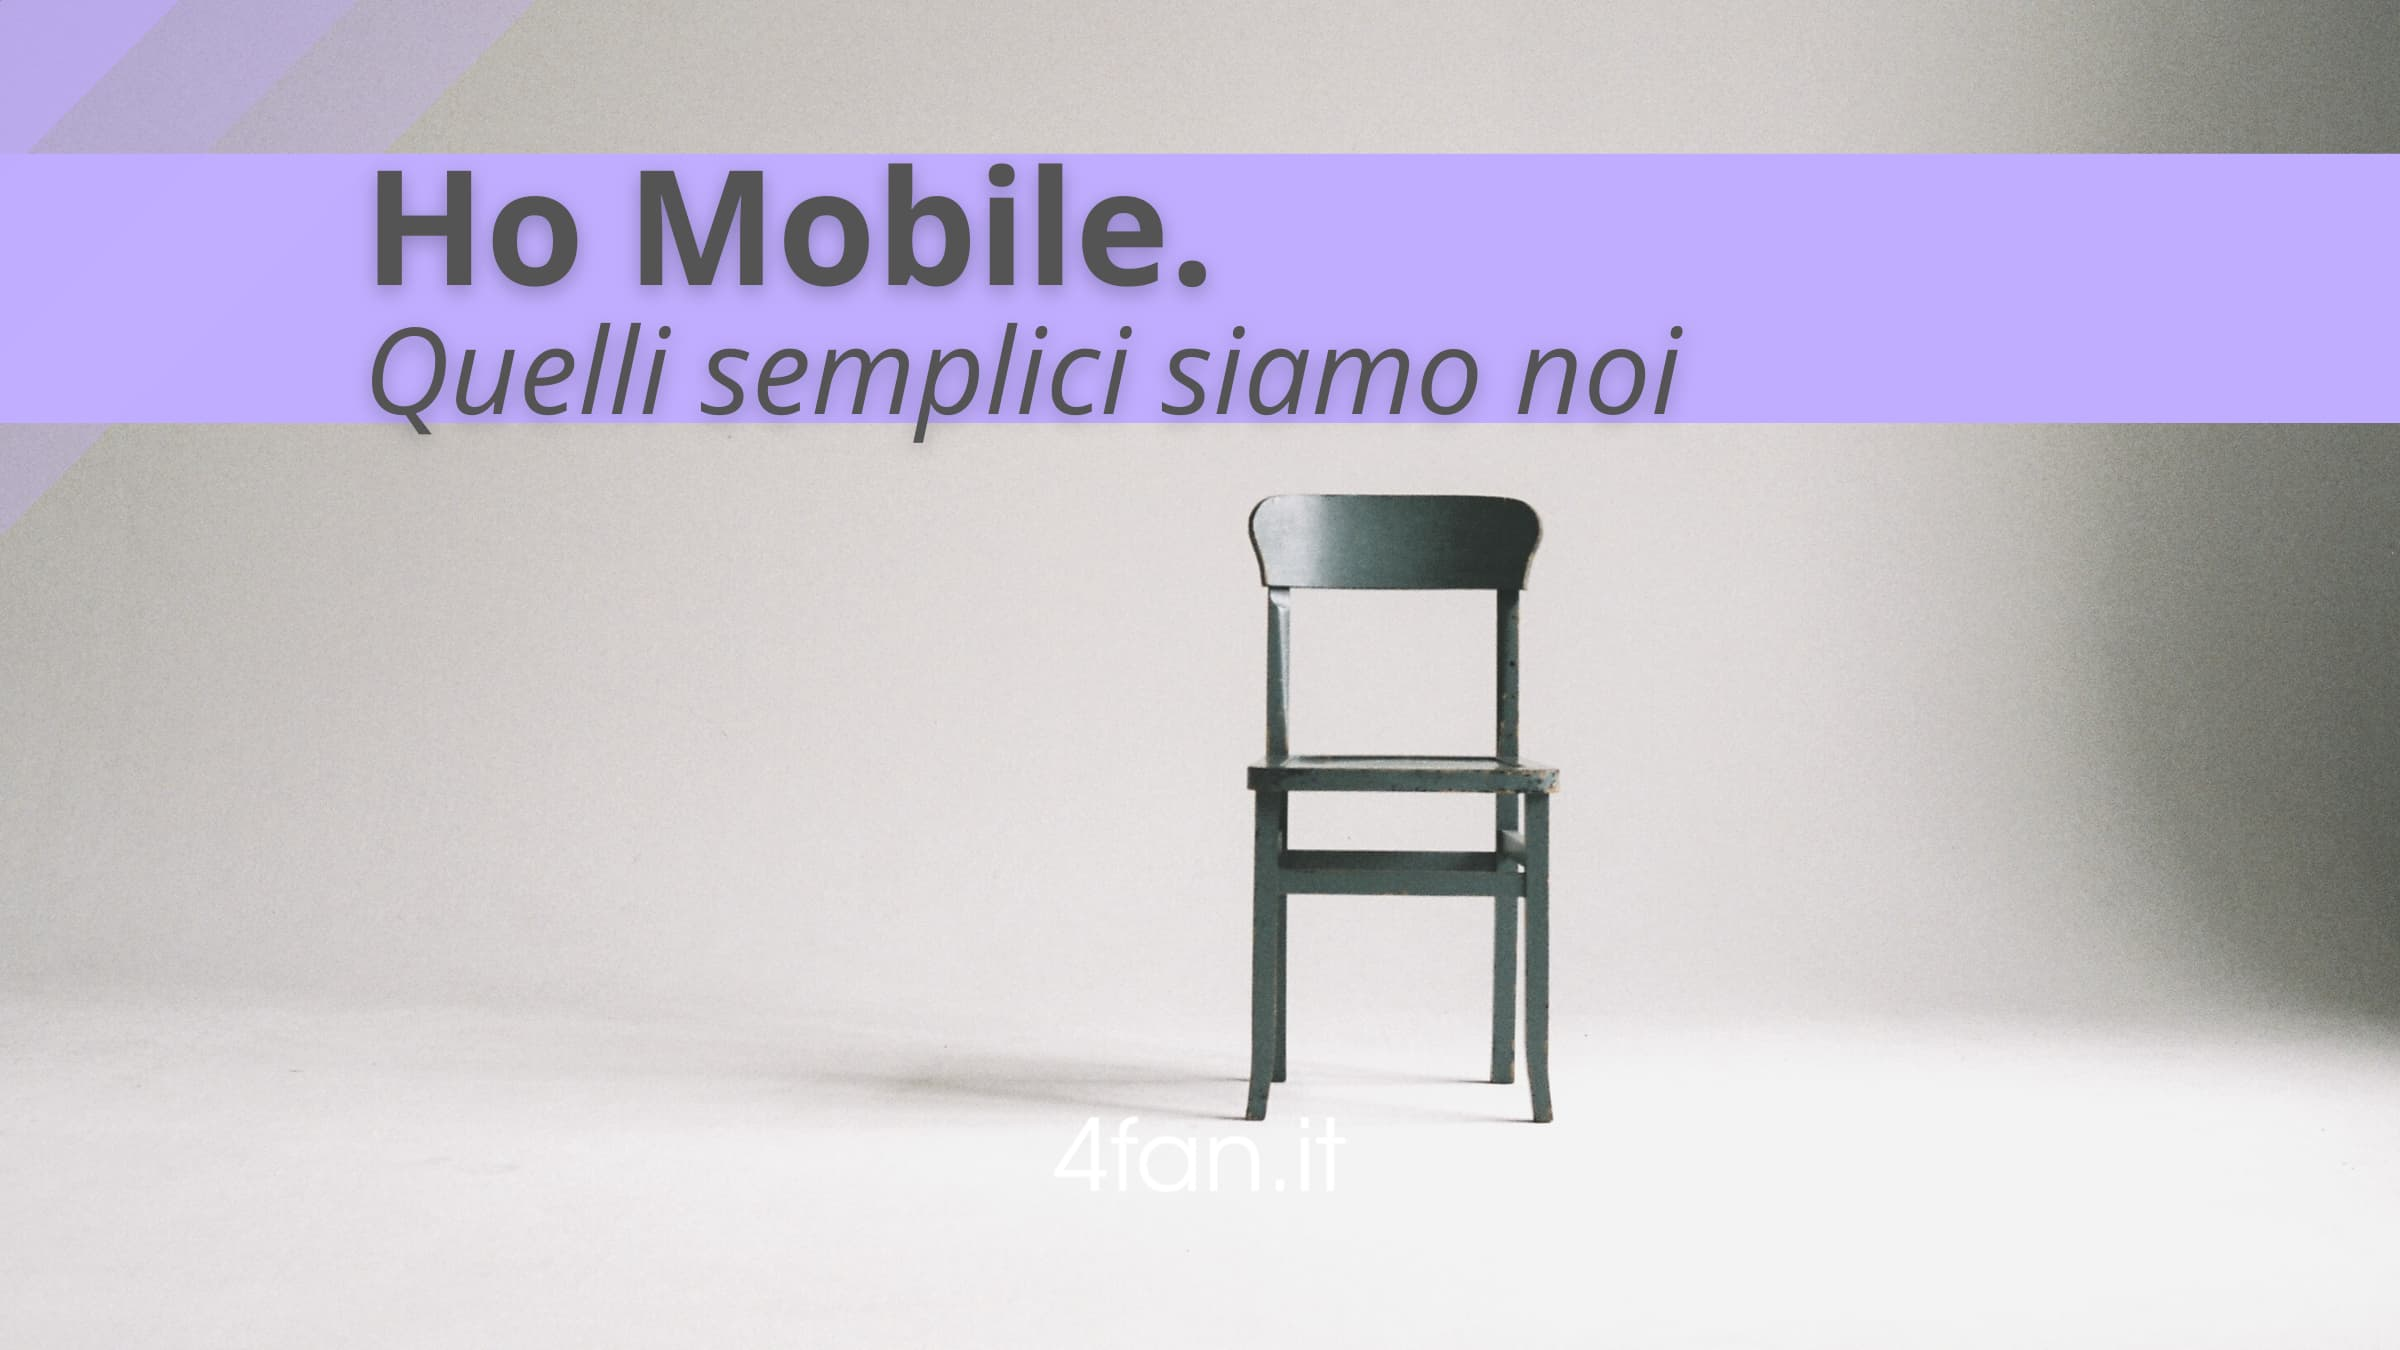 Ho Mobile semplici